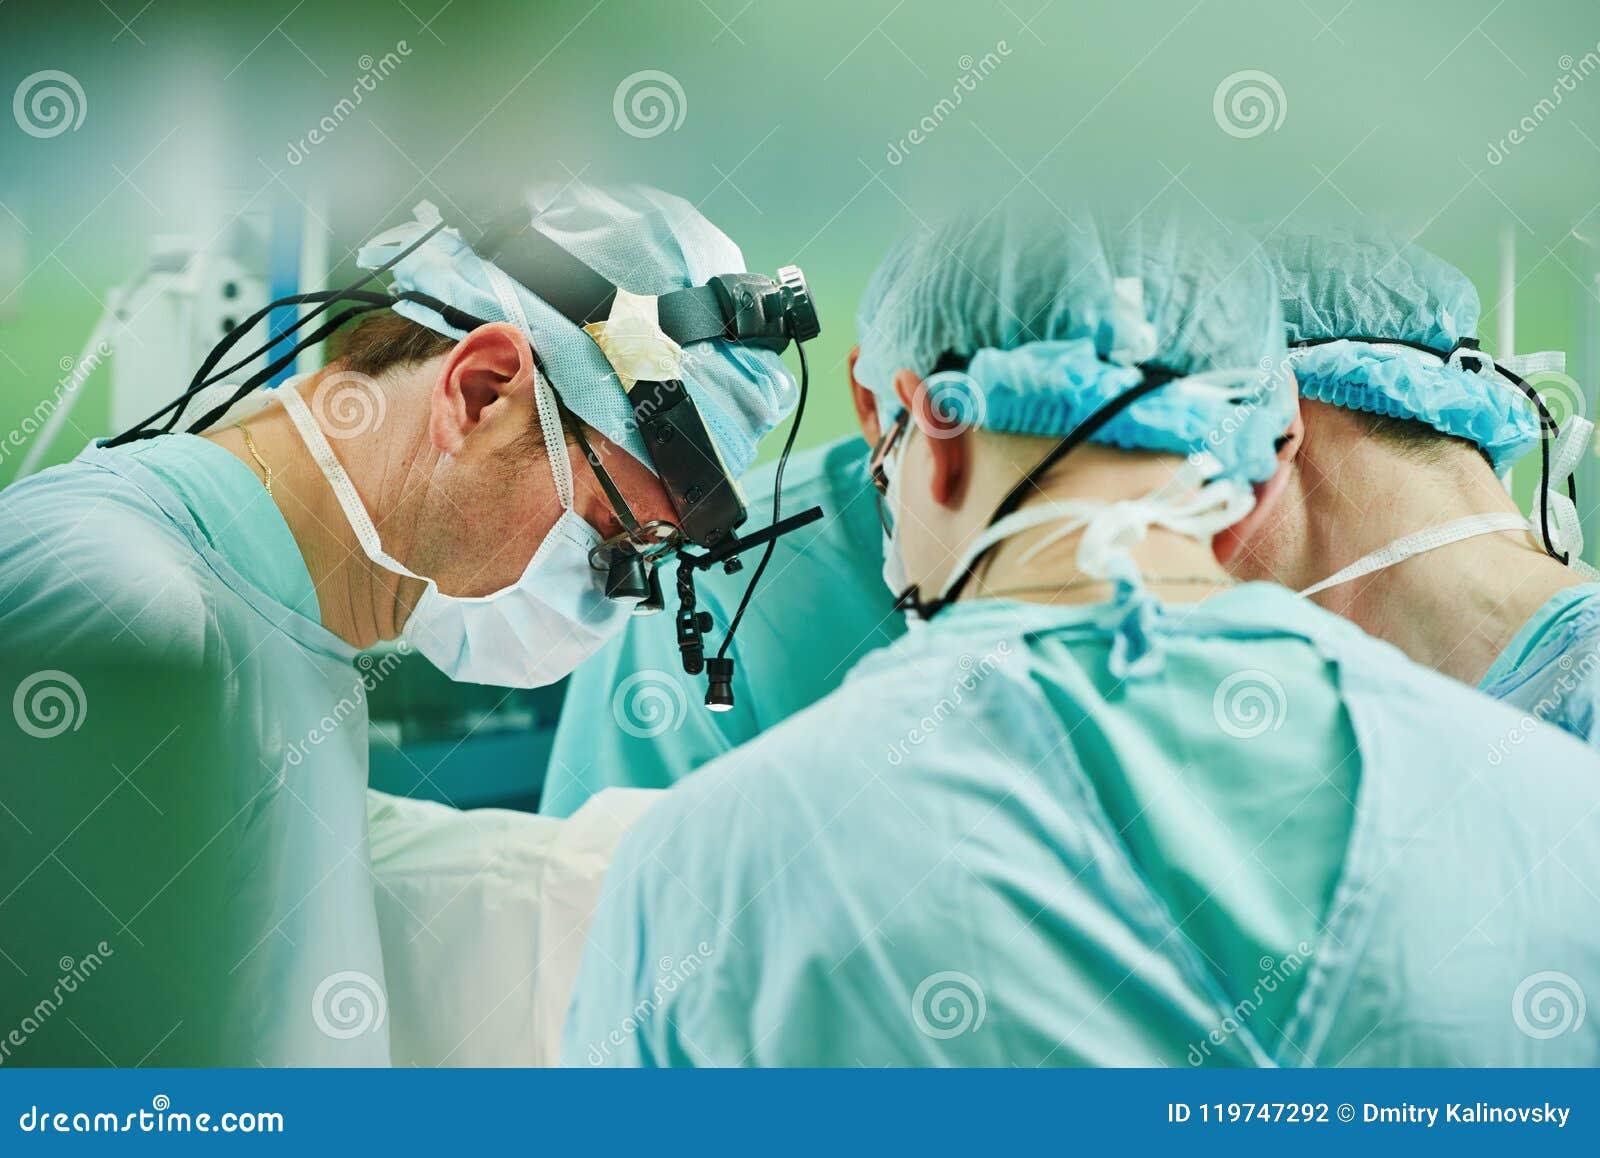 Cardio Surgery Operating Room Male Cardiac Surgeon In Hospital Stock Photo Image Of Hospital Insurance 119747292